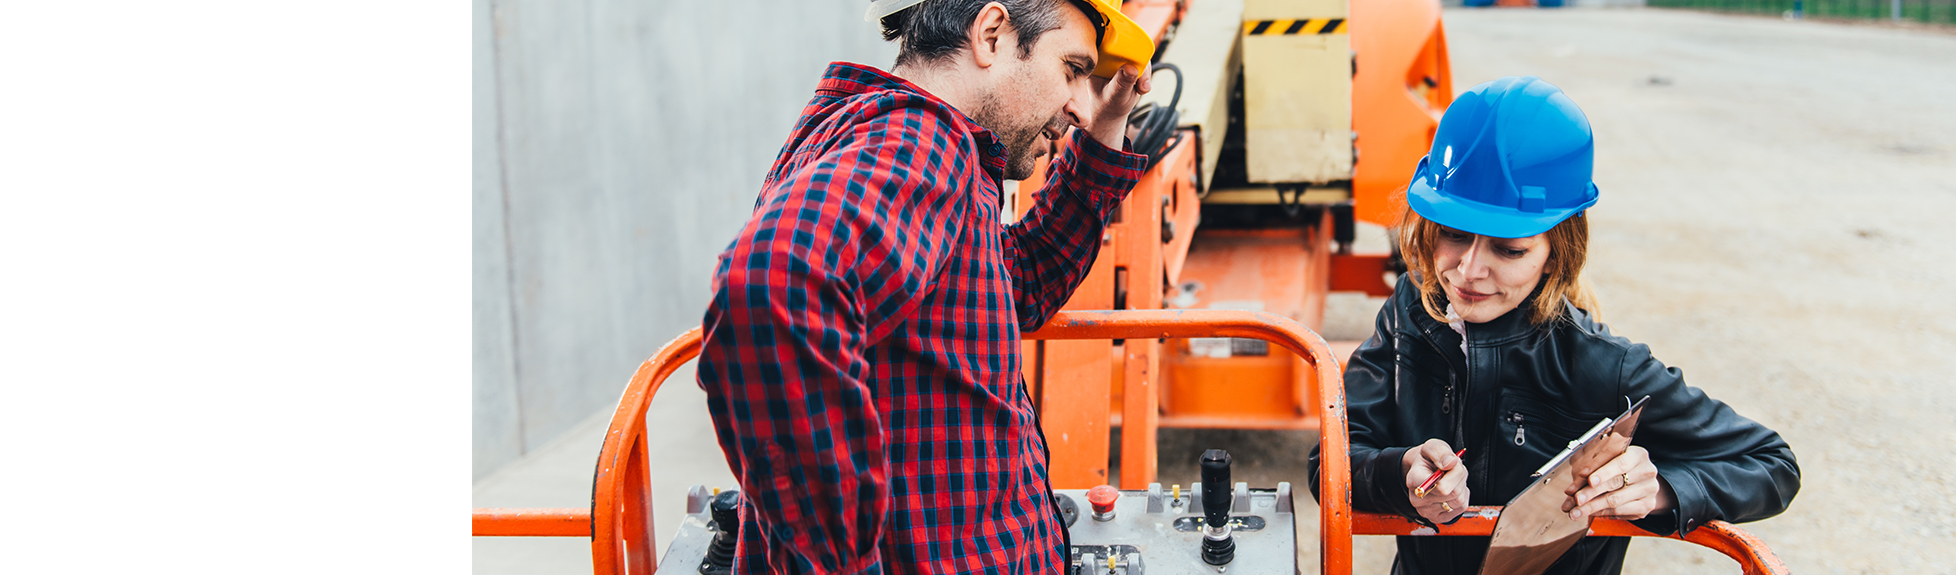 Mobile elevating work platforms compliance audits